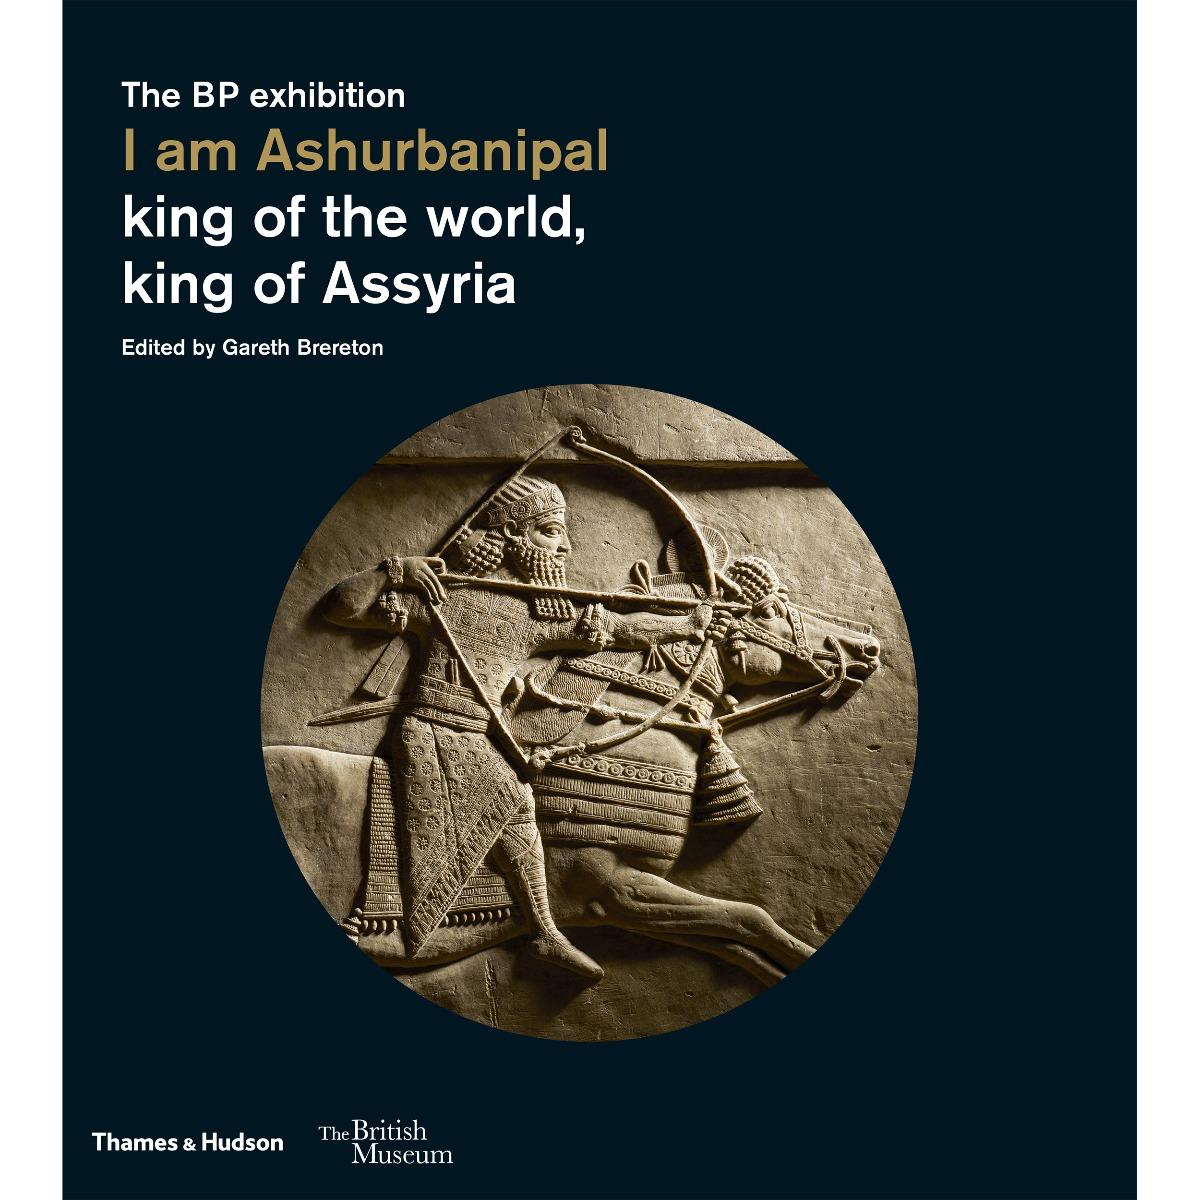 I am Ashurbanipal: king of the world, king of Assyria (hardback or paperback)